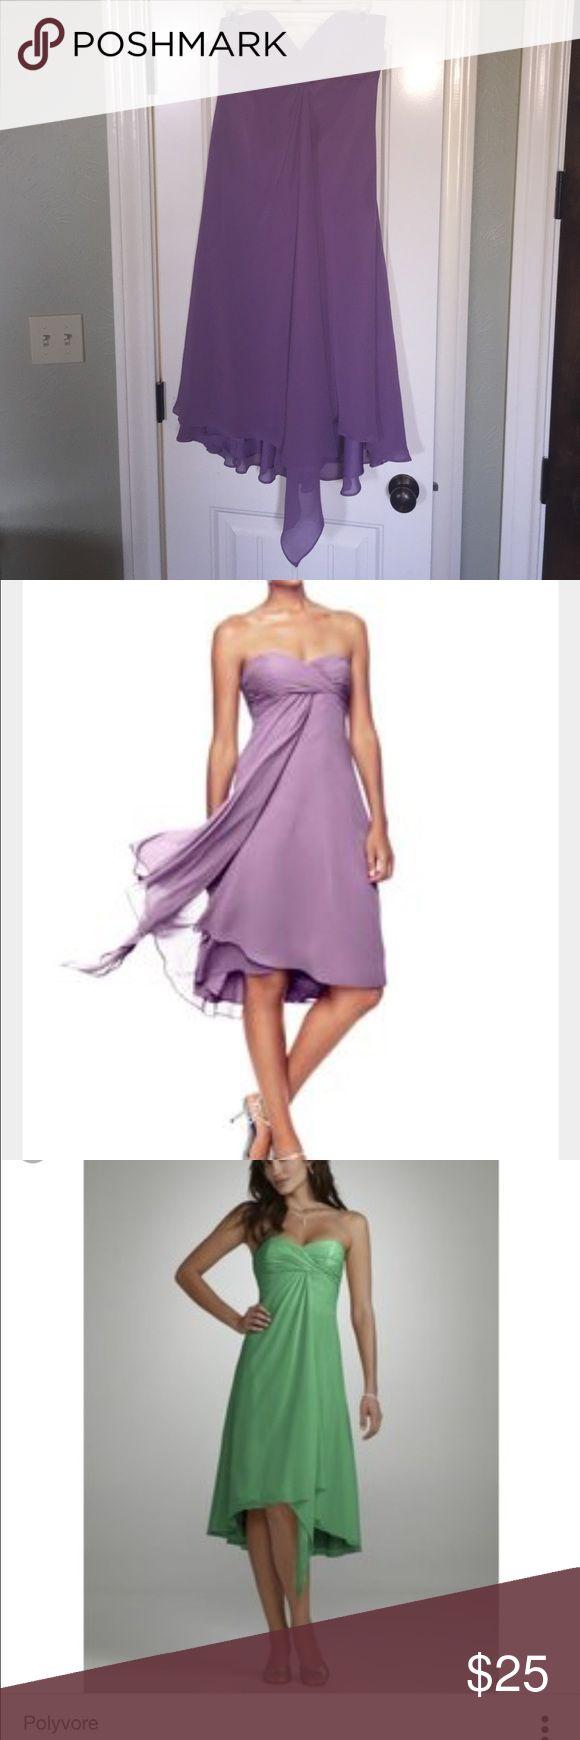 David's Bridal Strapless Chiffon Short Dress David's Bridal Strapless Chiffon Dress in light purple. Only worn once. Size 8. David's Bridal Dresses Strapless